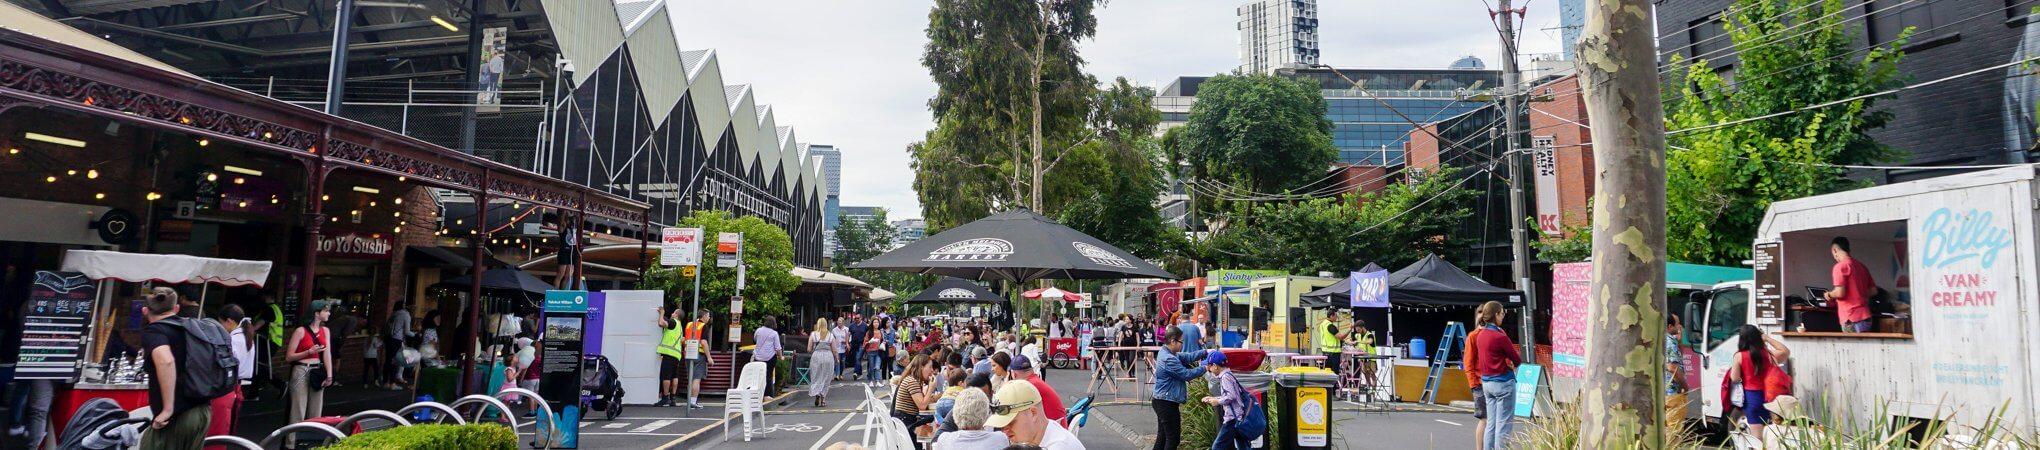 HOT: South Melbourne Night Market, South Melbourne